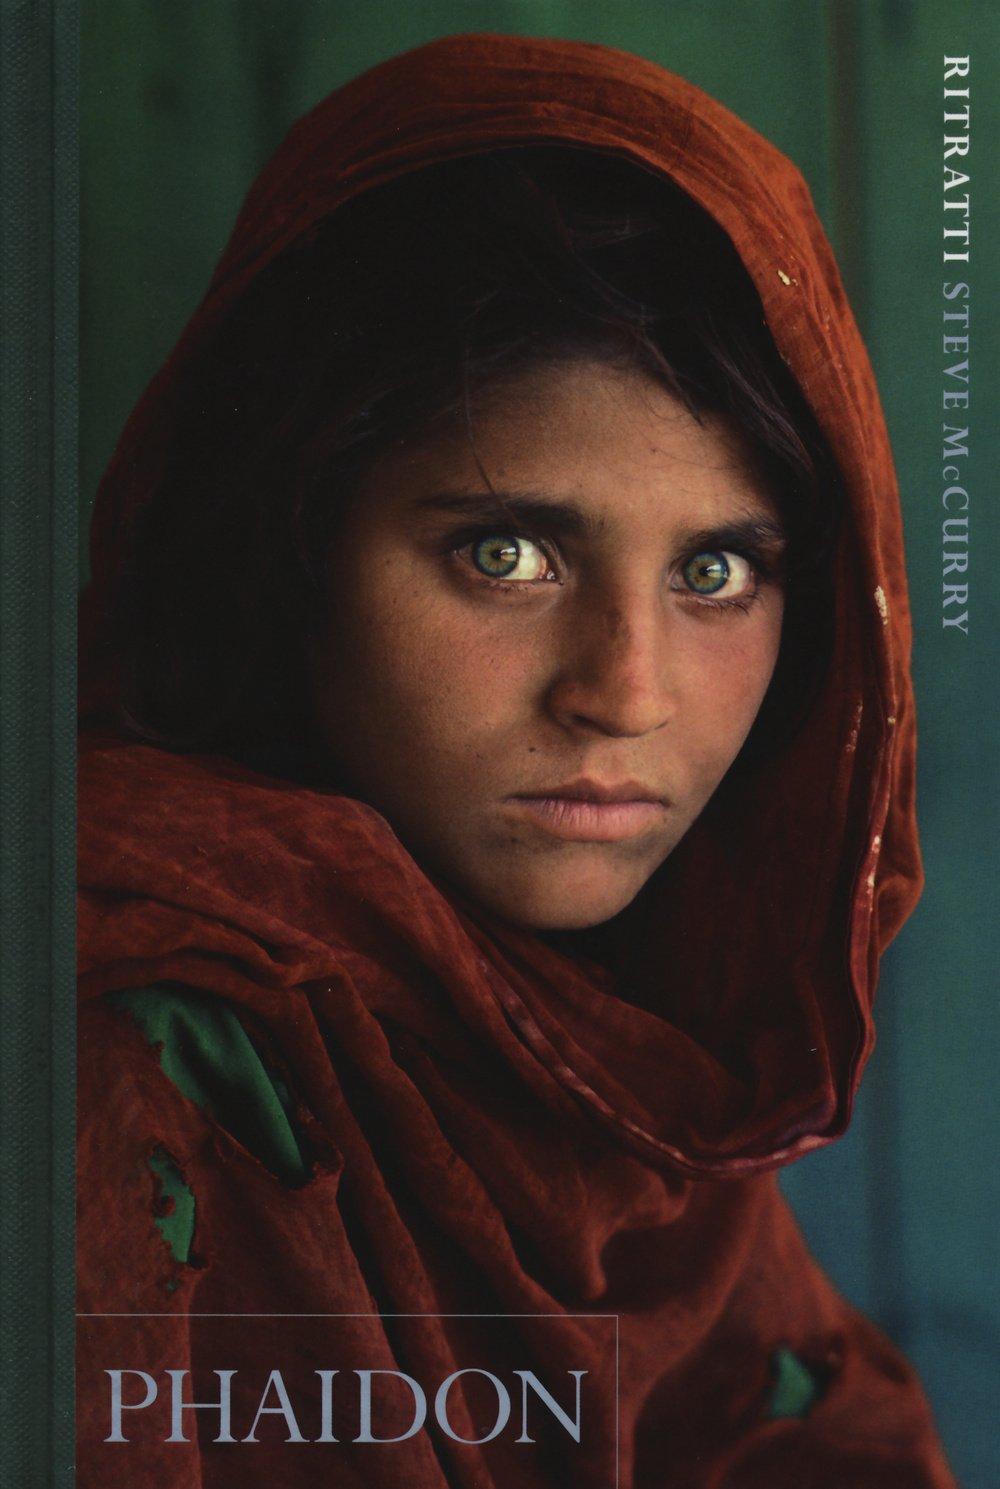 Ritratti. Ediz. illustrata Copertina rigida – 1 ott 2015 Steve McCurry C. Ribacchi Phaidon 0714870307